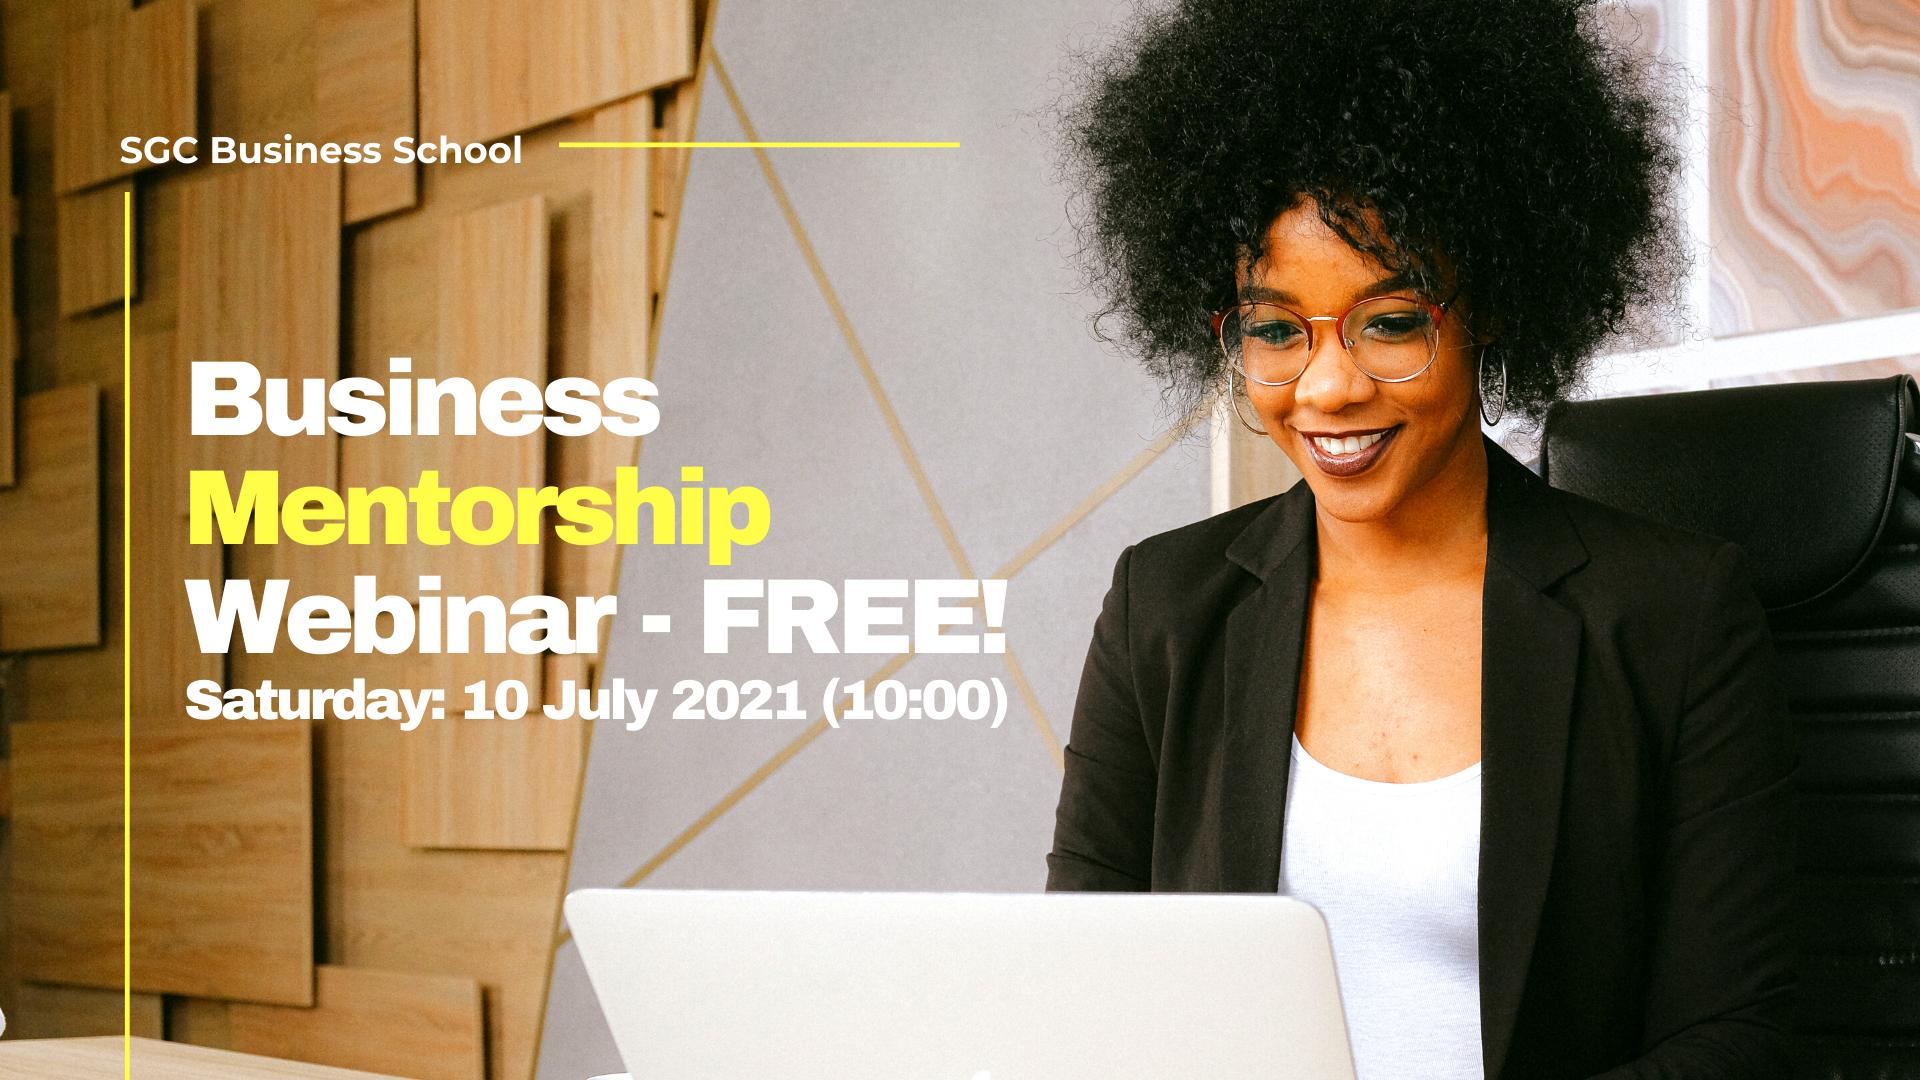 FREE Business Mentorship Webinar